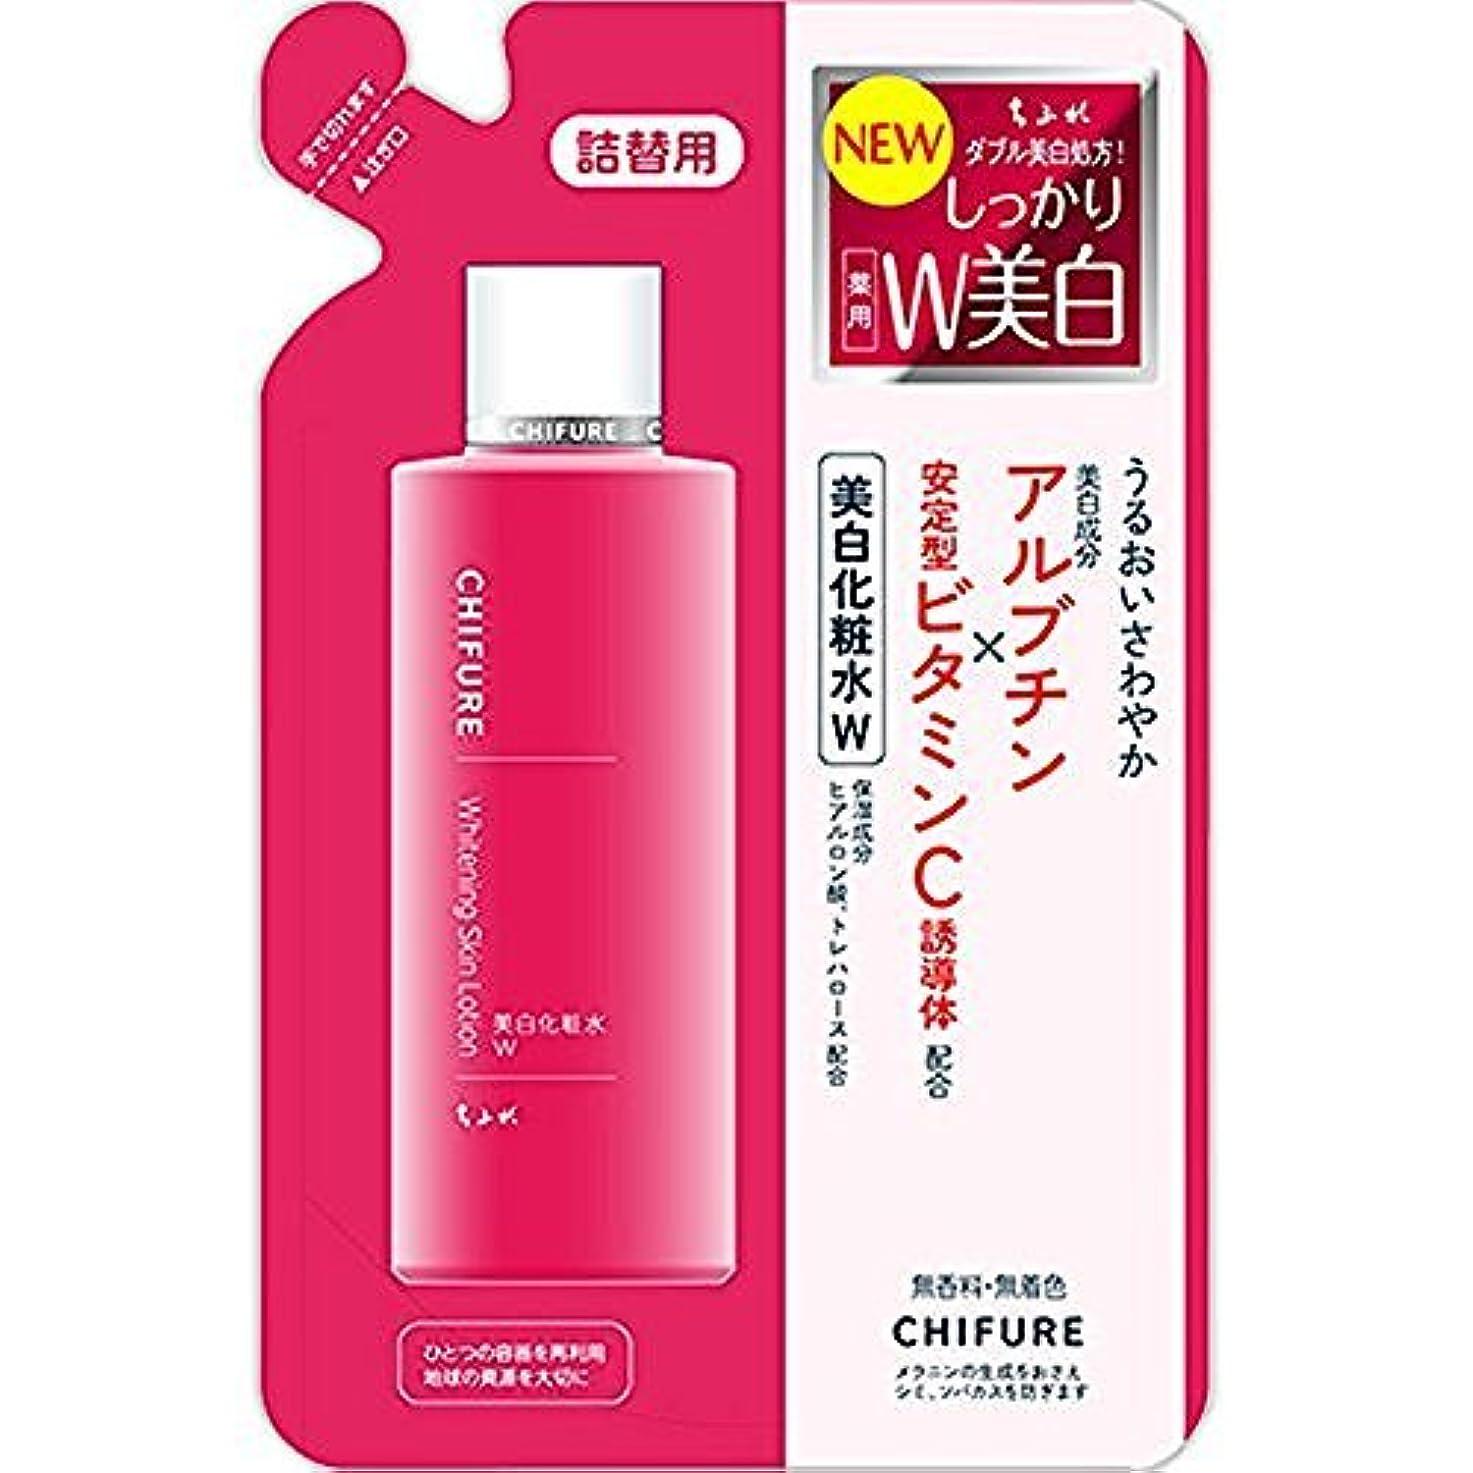 達成境界後悔ちふれ化粧品 美白化粧水 W 詰替用 180ML (医薬部外品)